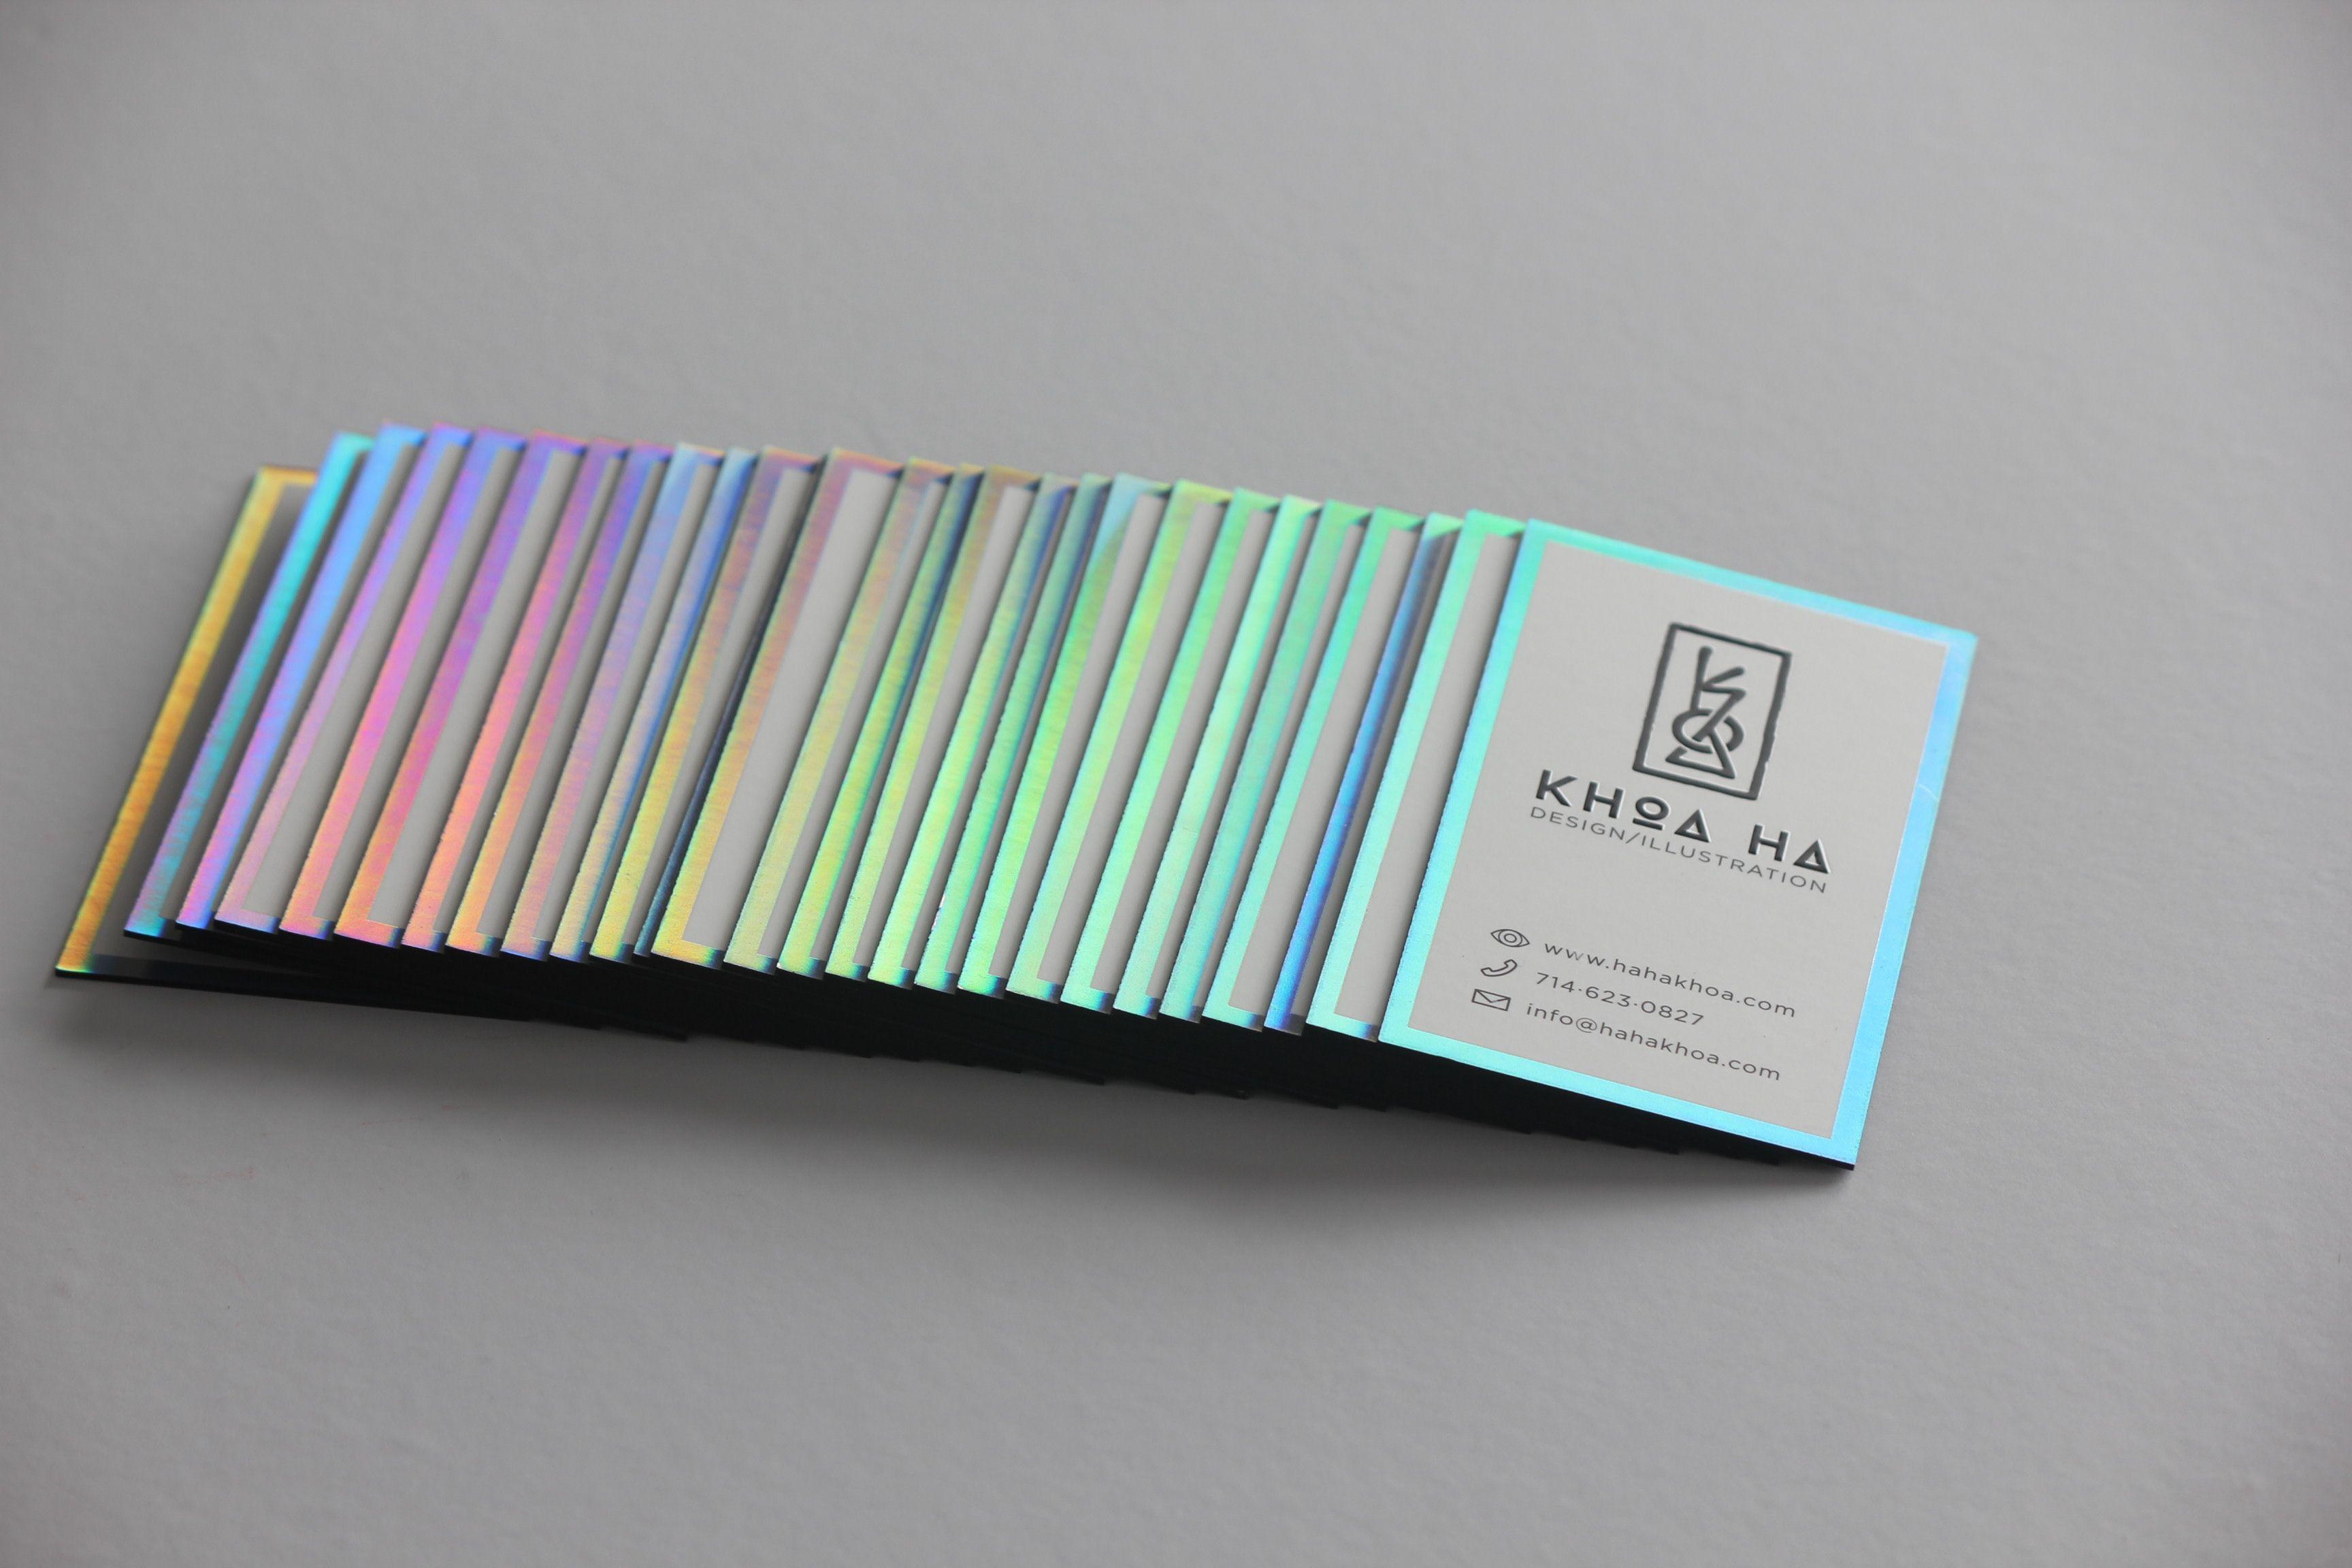 32pt Silk Laminated Business Cards • Black Edge Paint • Spectrum ...